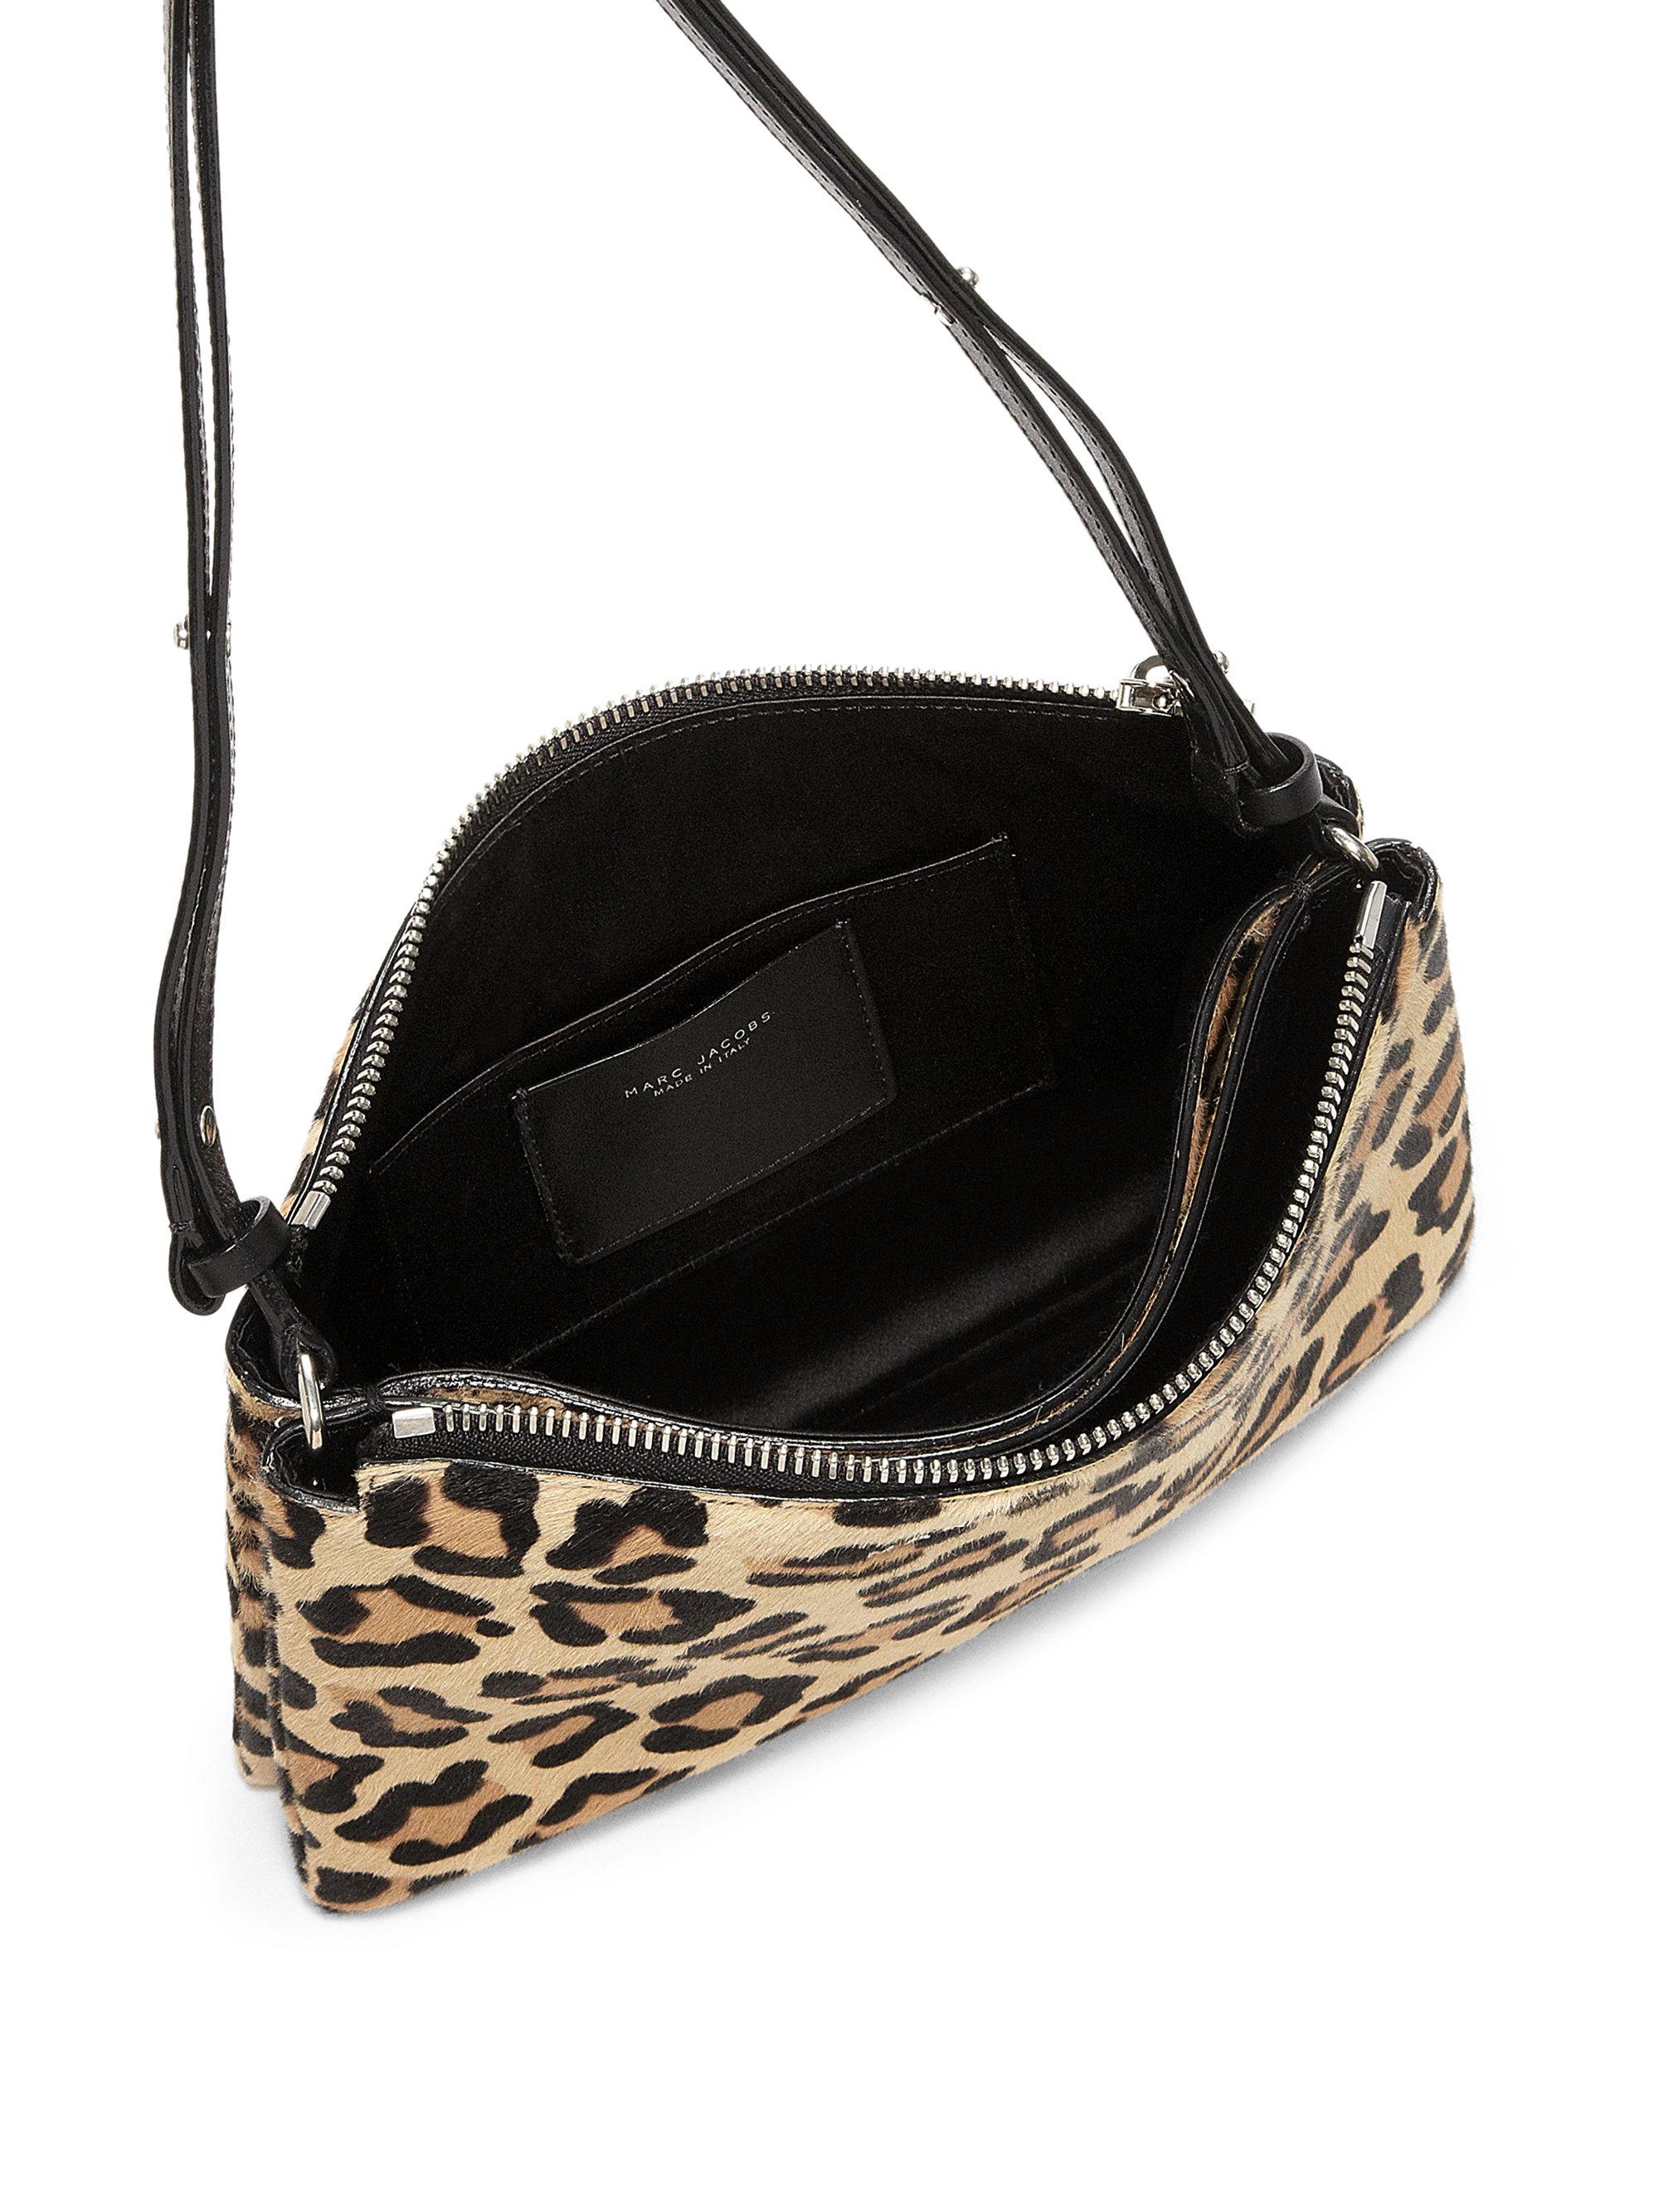 Lyst - Marc Jacobs Double-pouch Leopard-print Calf Hair Crossbody Bag 419a4868de725